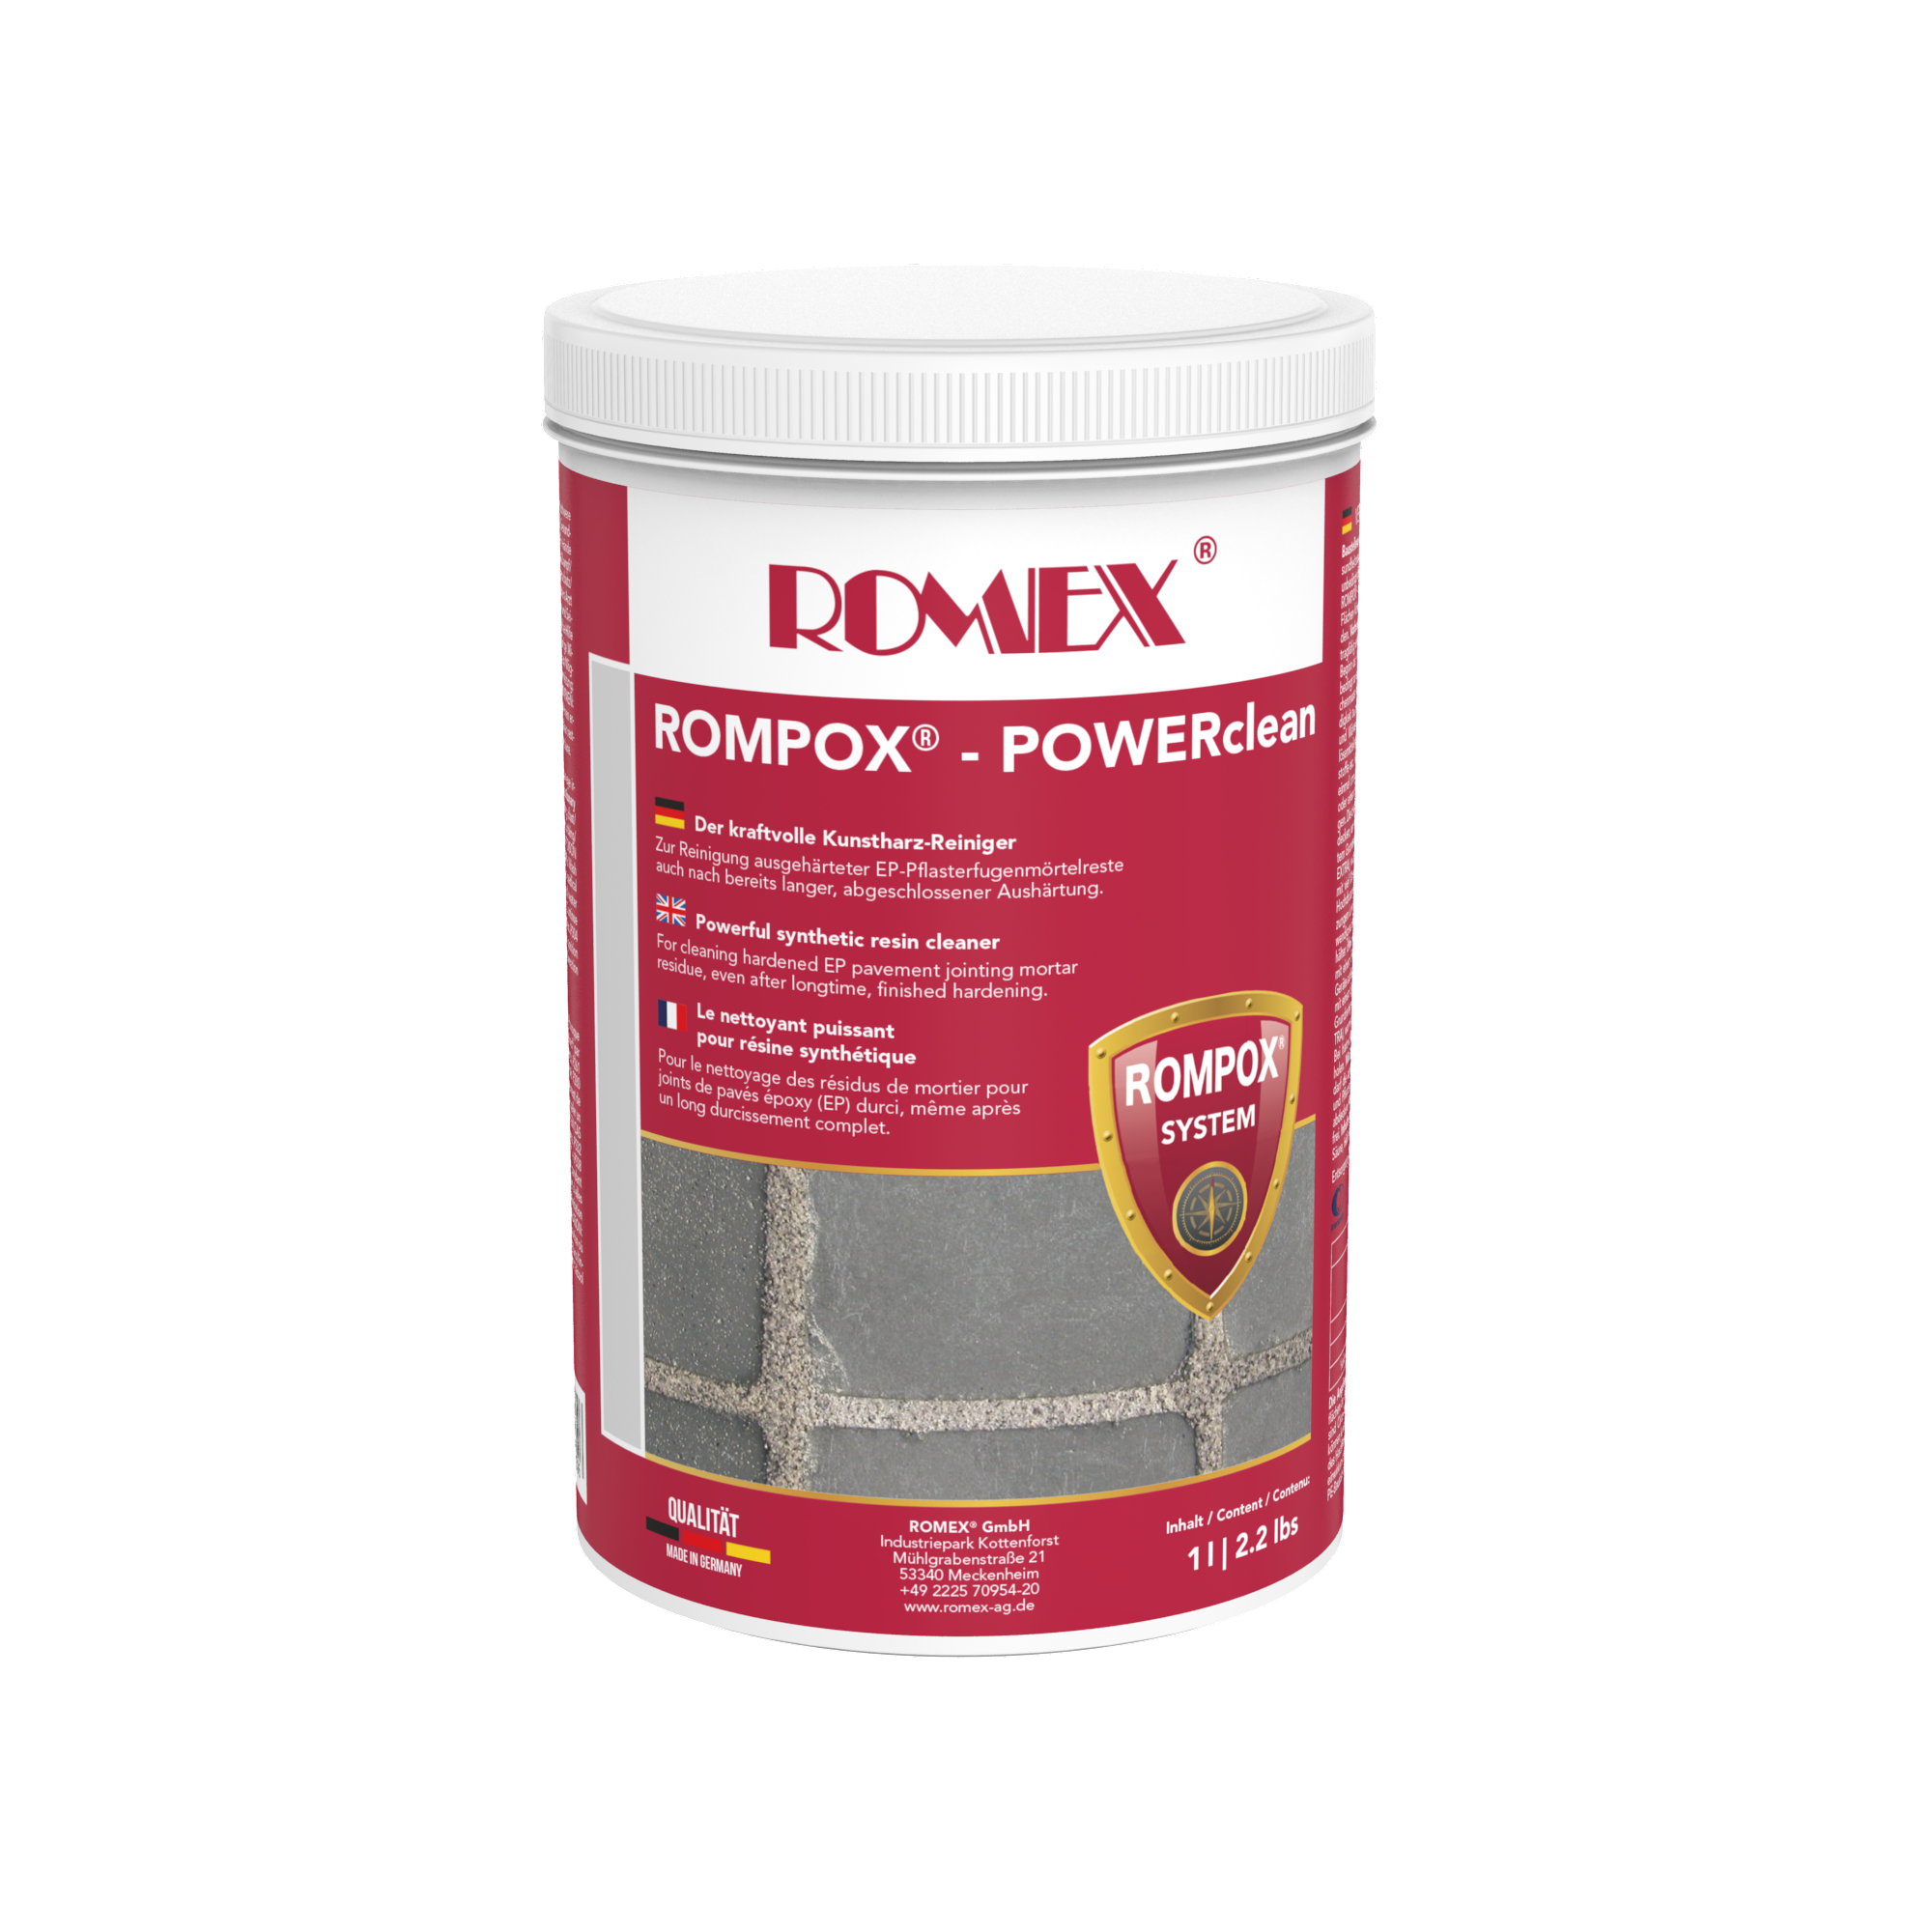 ROMPOX® - POWERclean 1 Liter